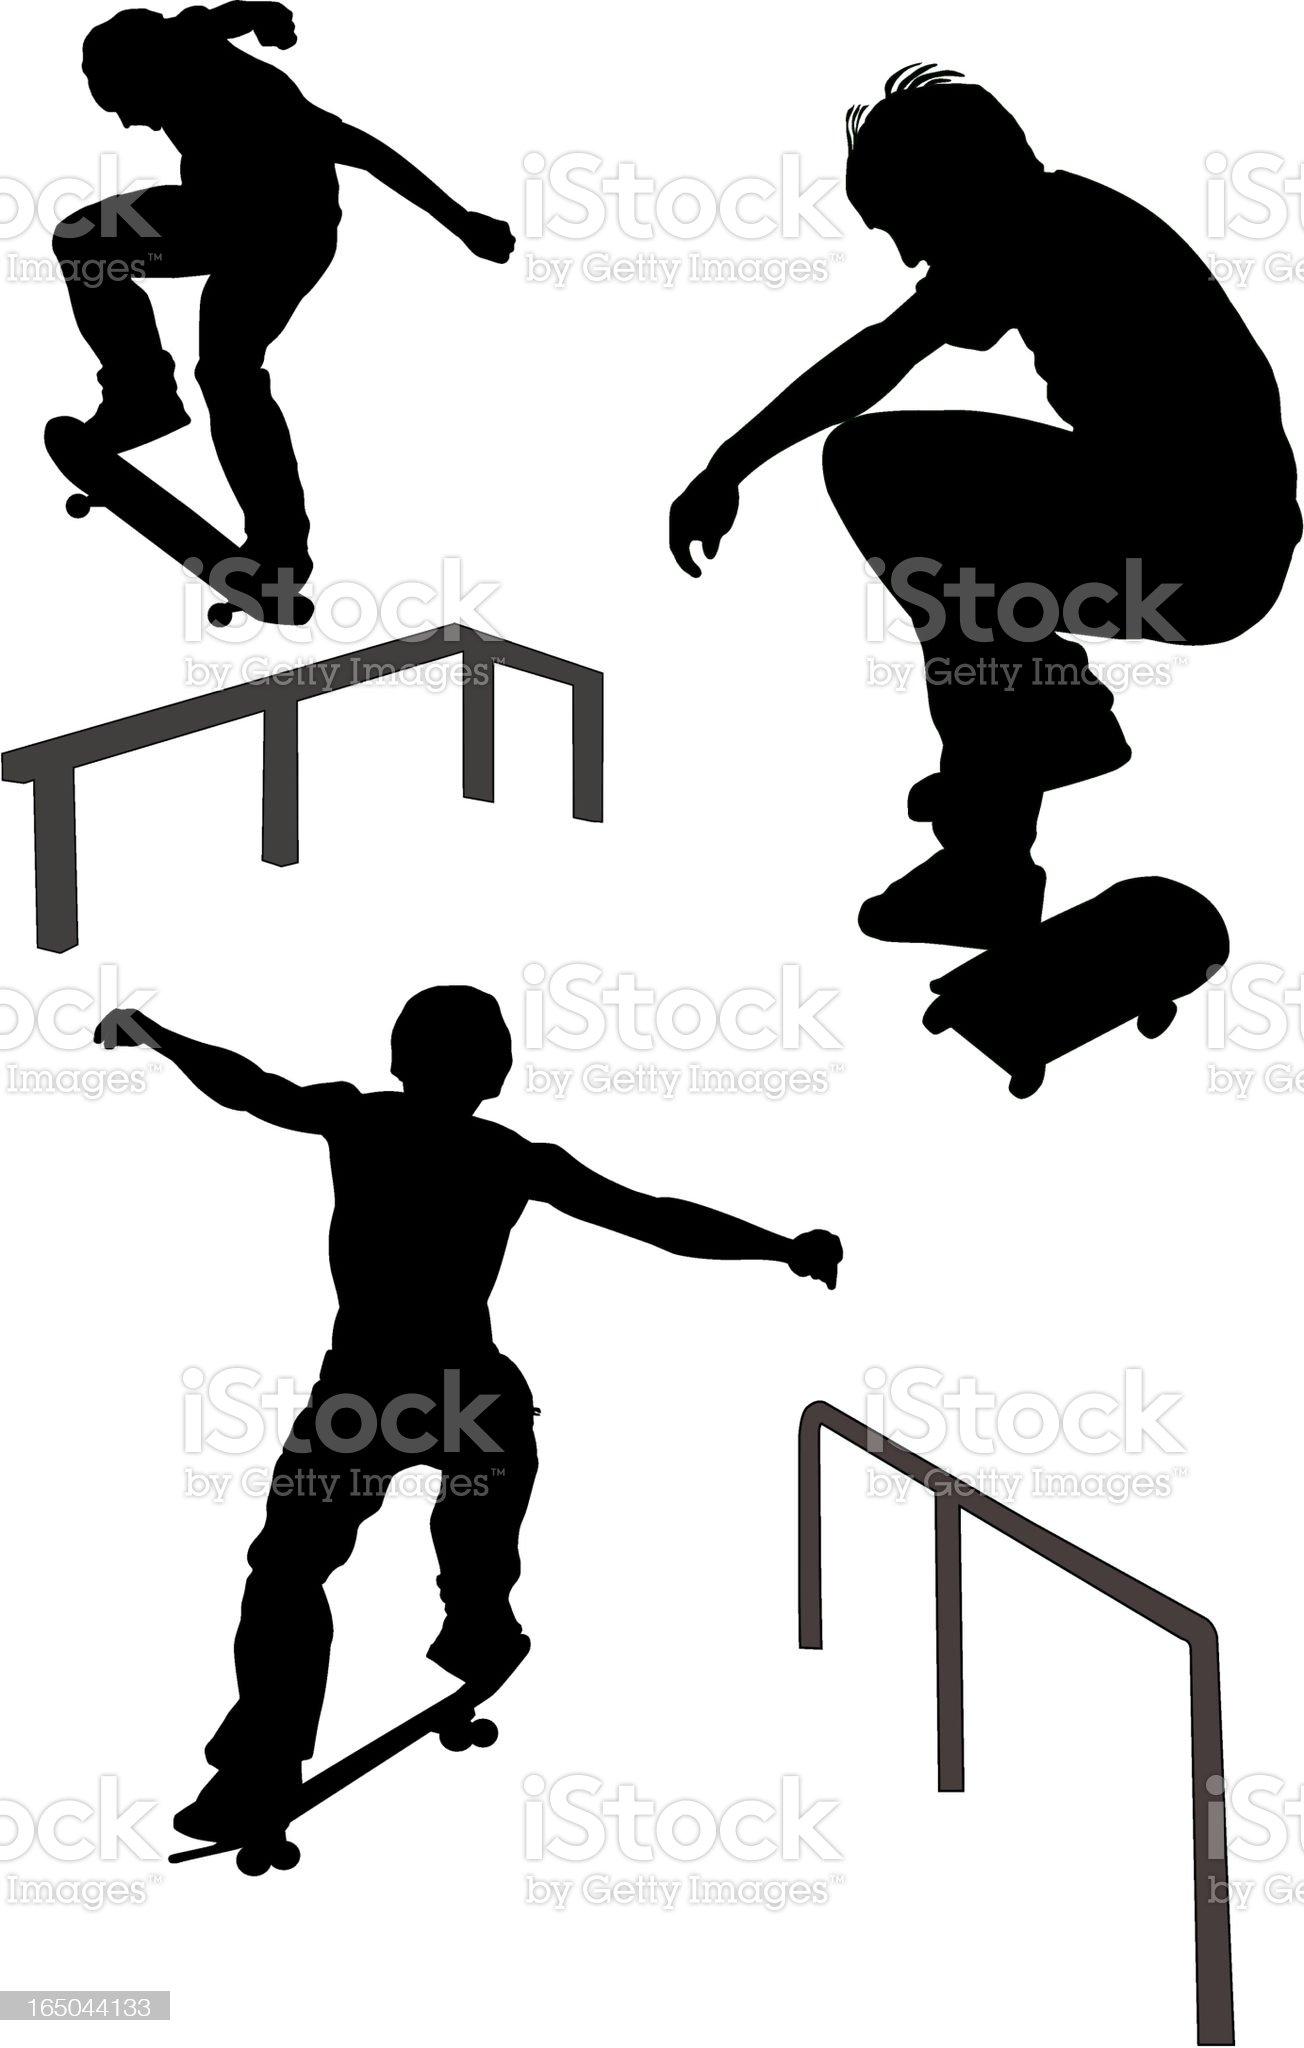 Skateboarders (Vector) royalty-free stock vector art